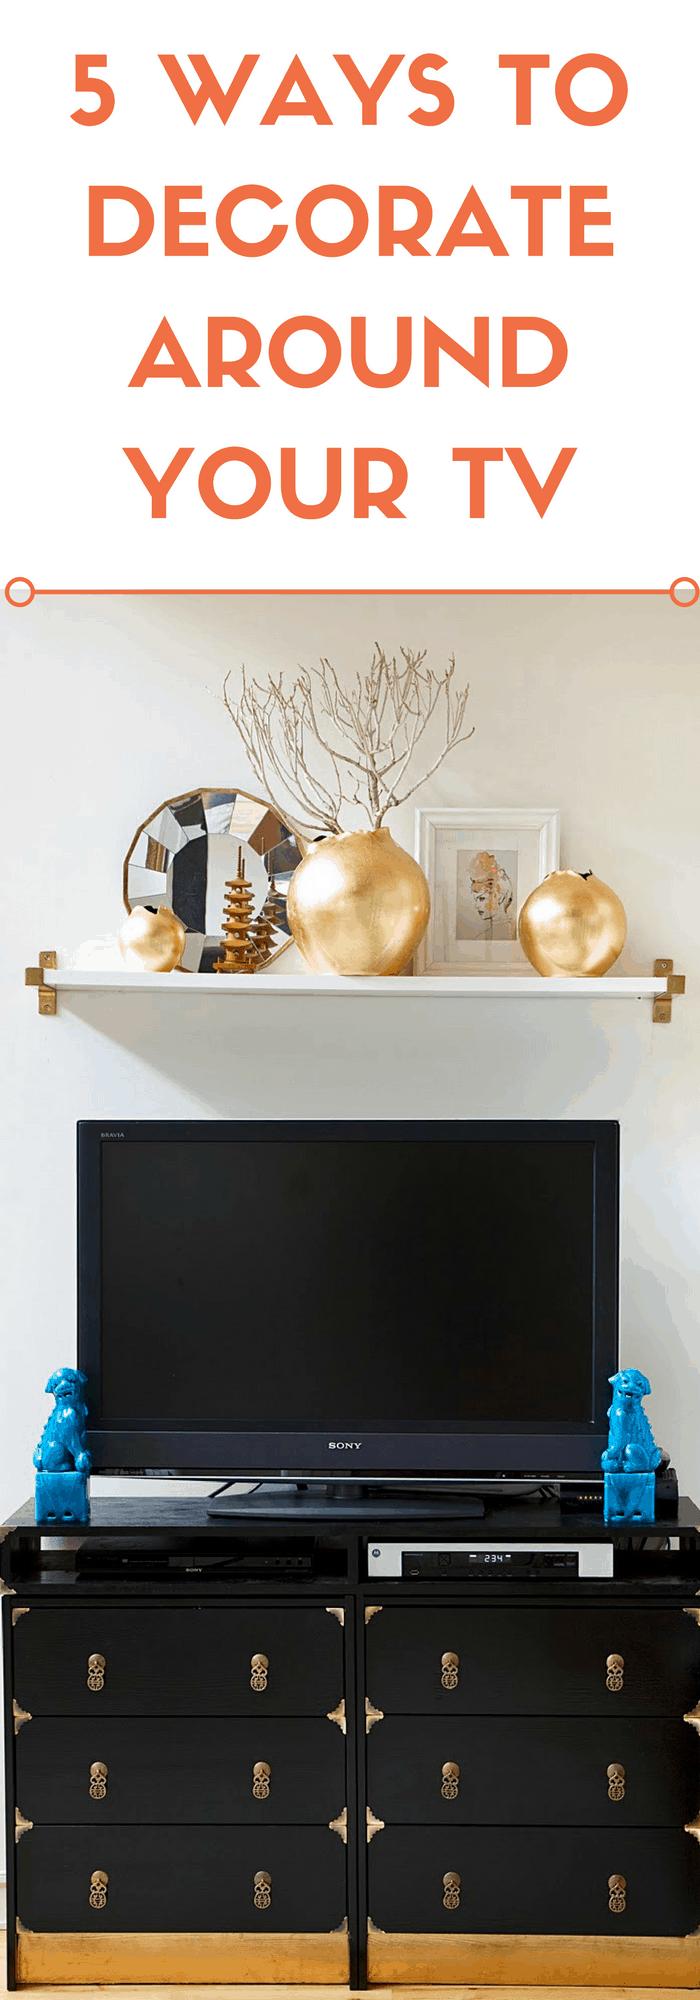 5 ways to decorate around your tv